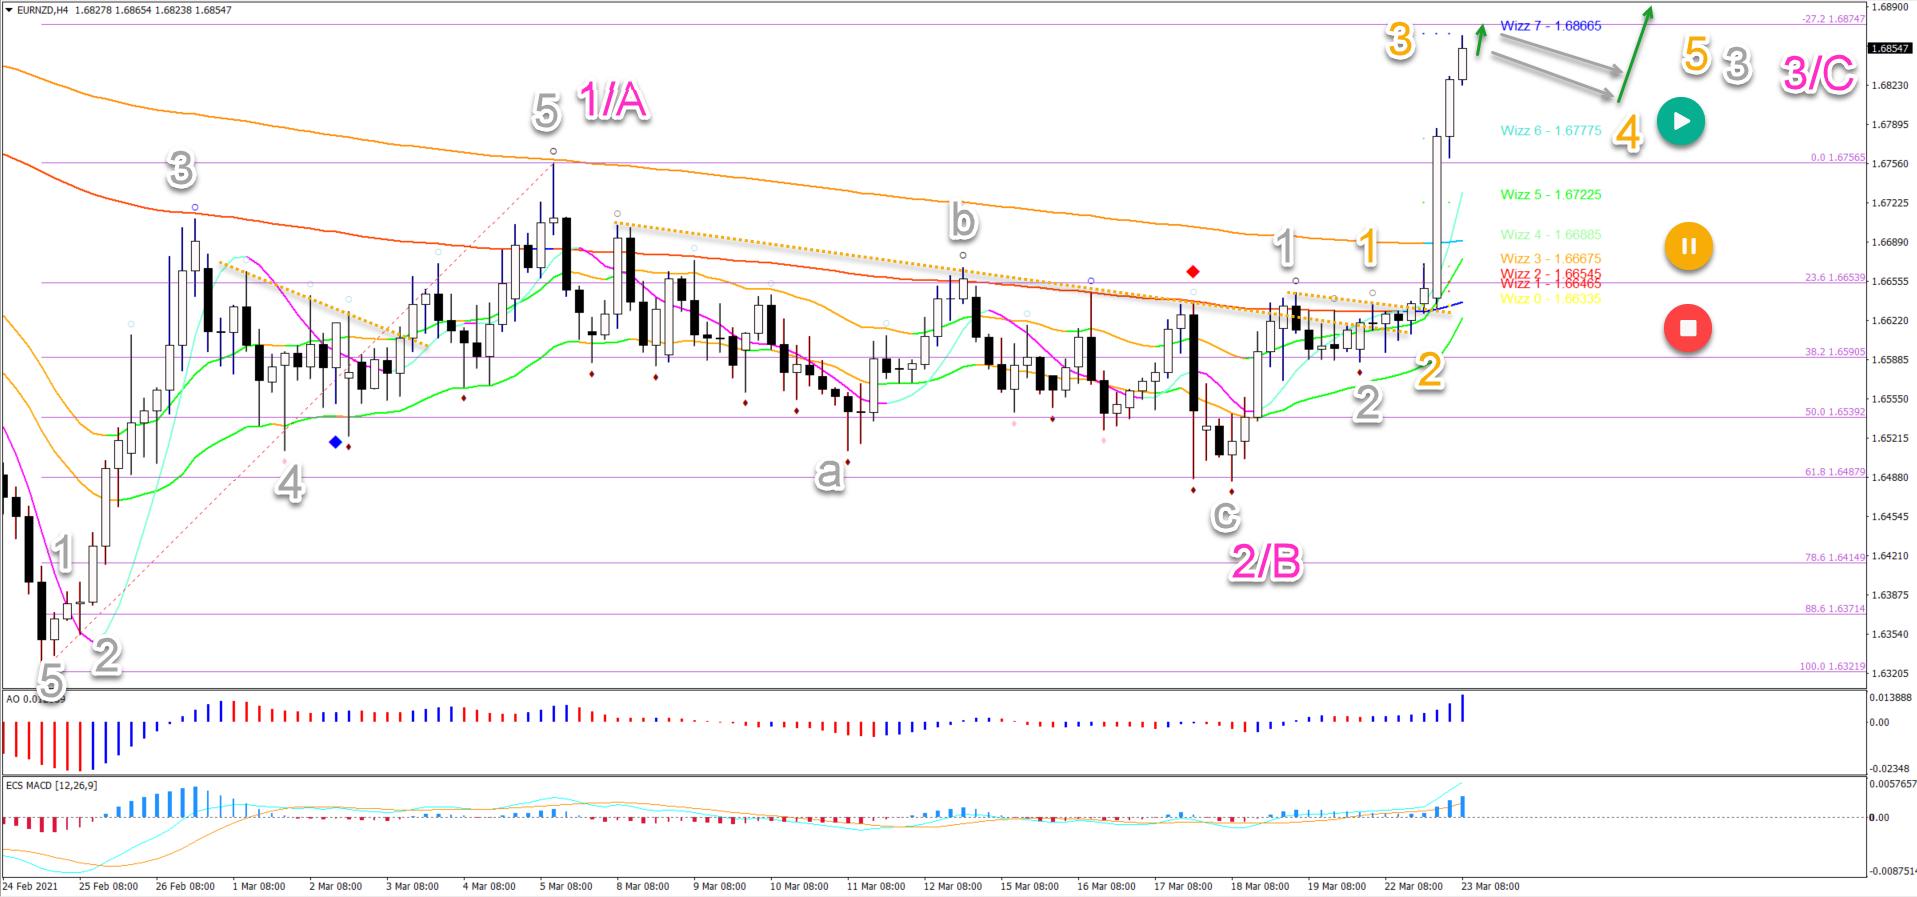 EUR/NZD 23.03.2021 4 hour chart